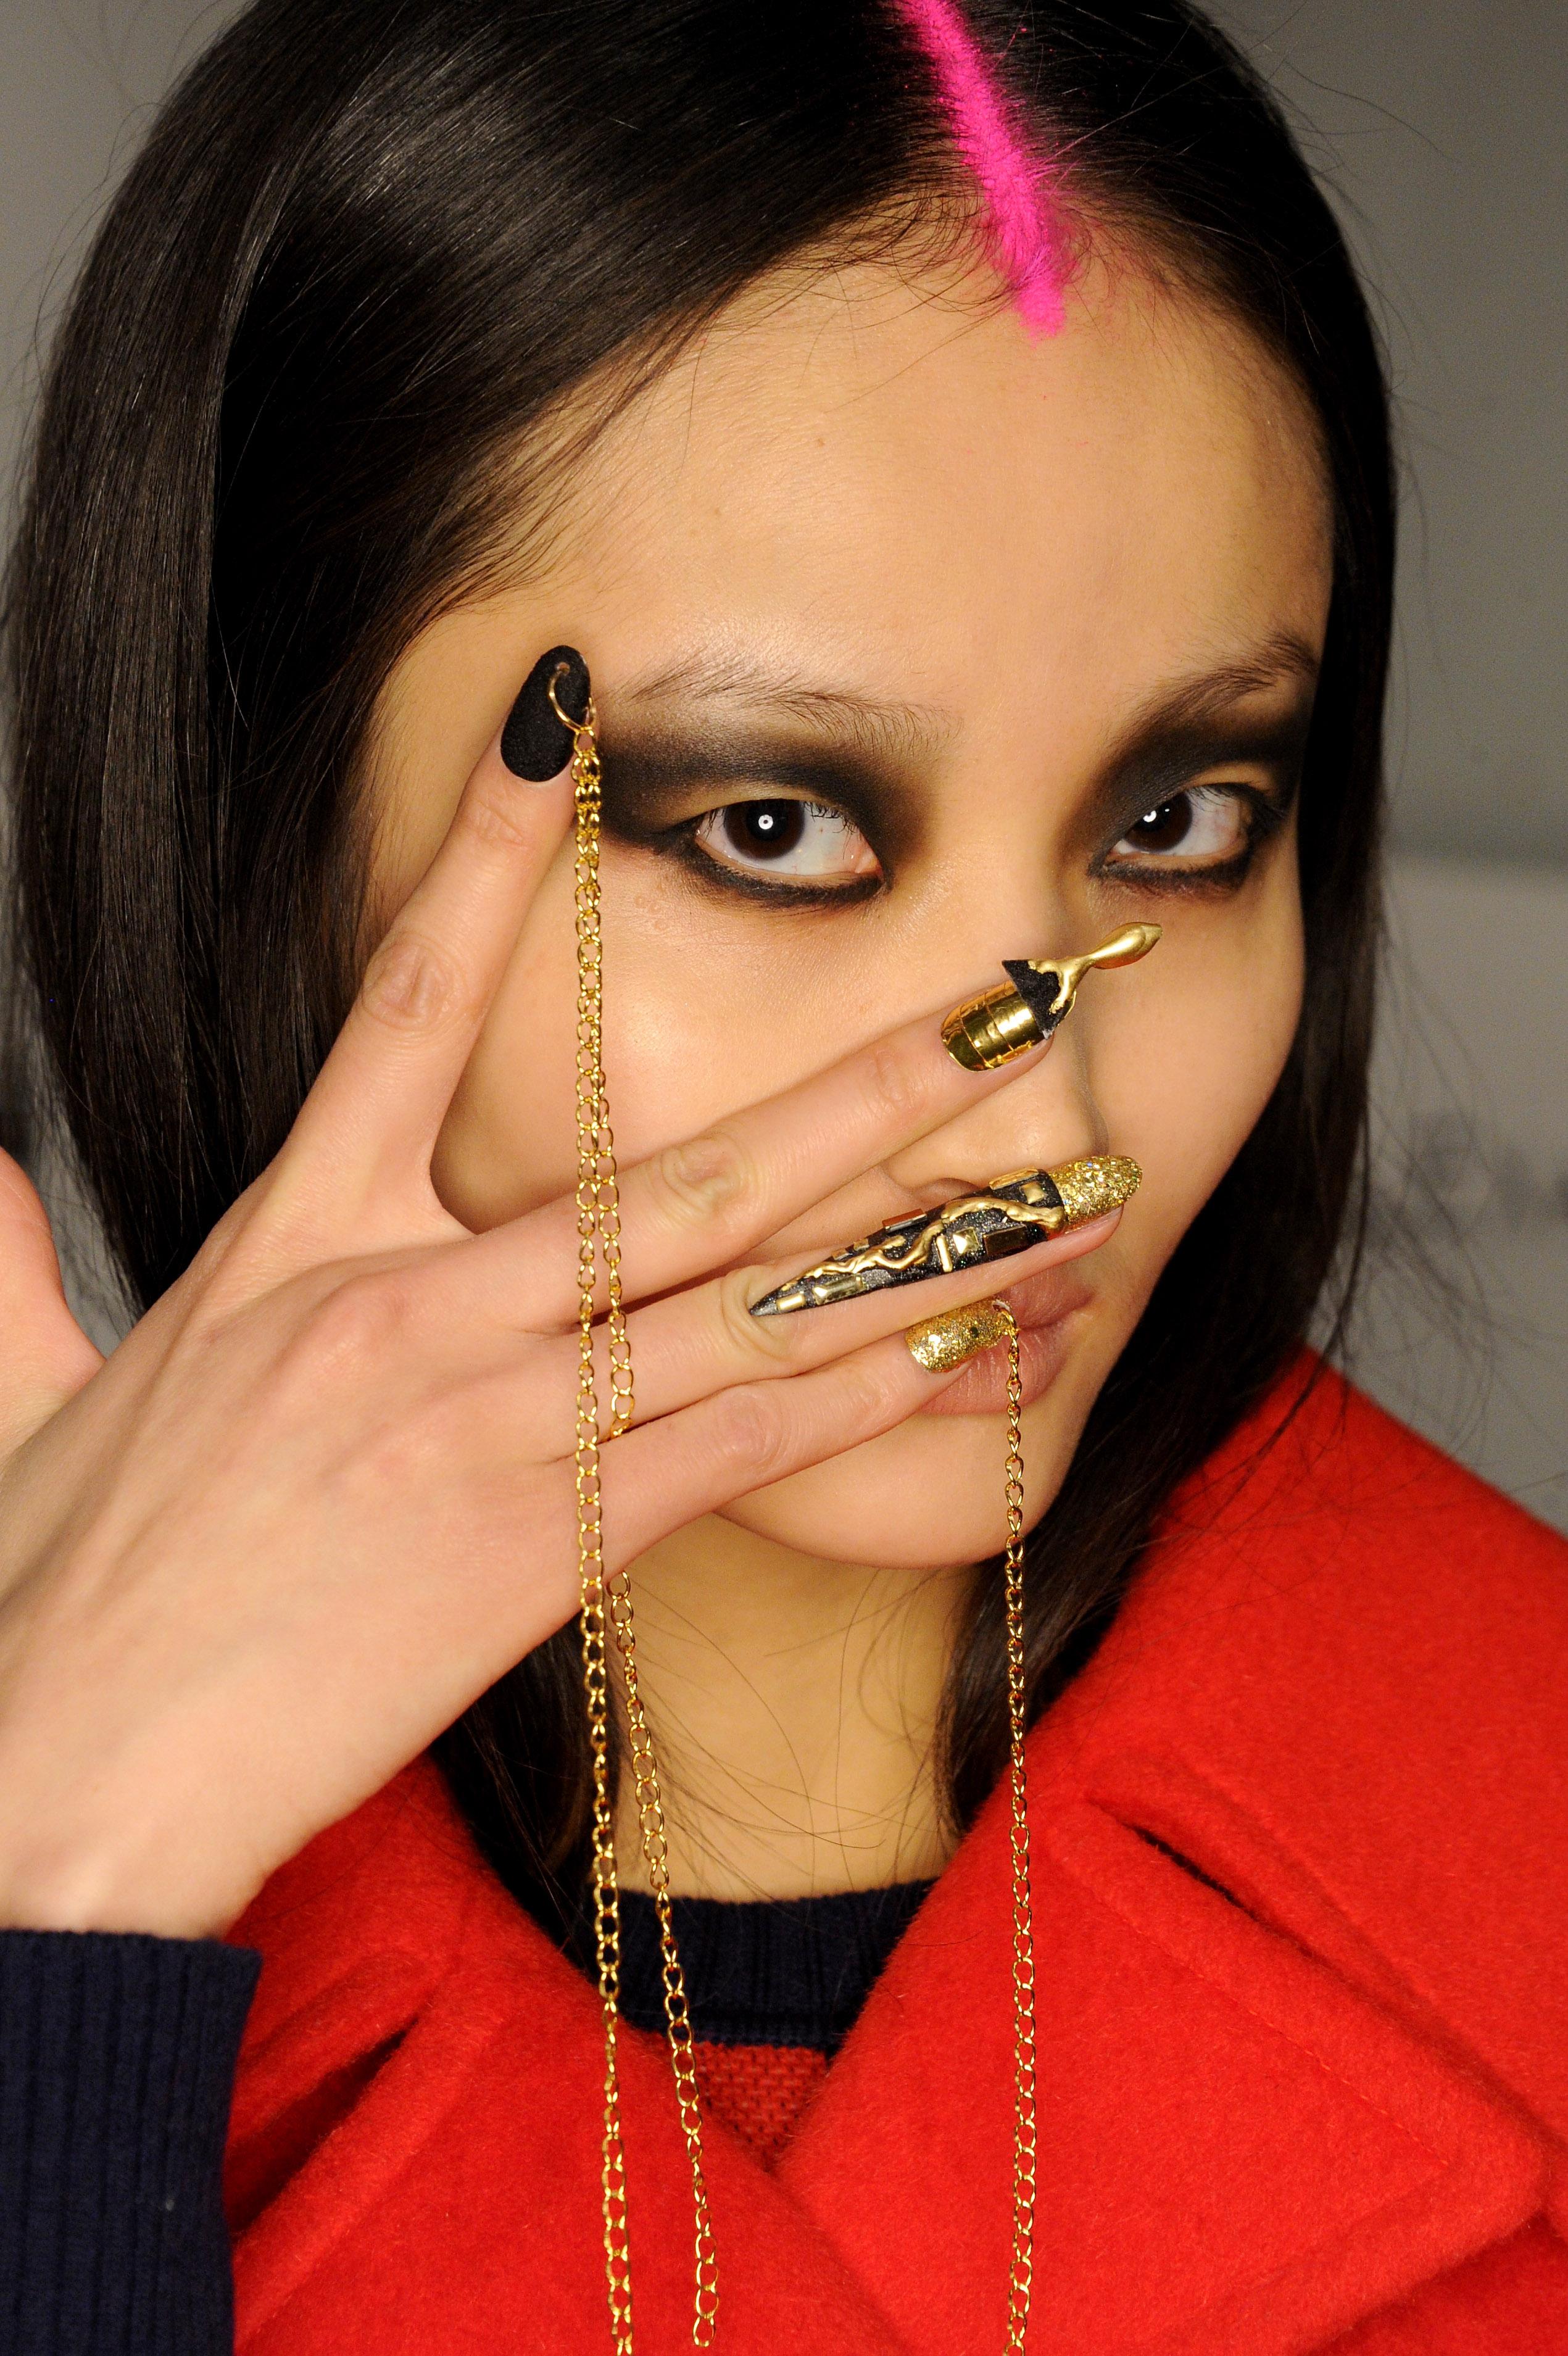 CND Creates Artistic Nail Art for Libertine NYFW Show | American Salon